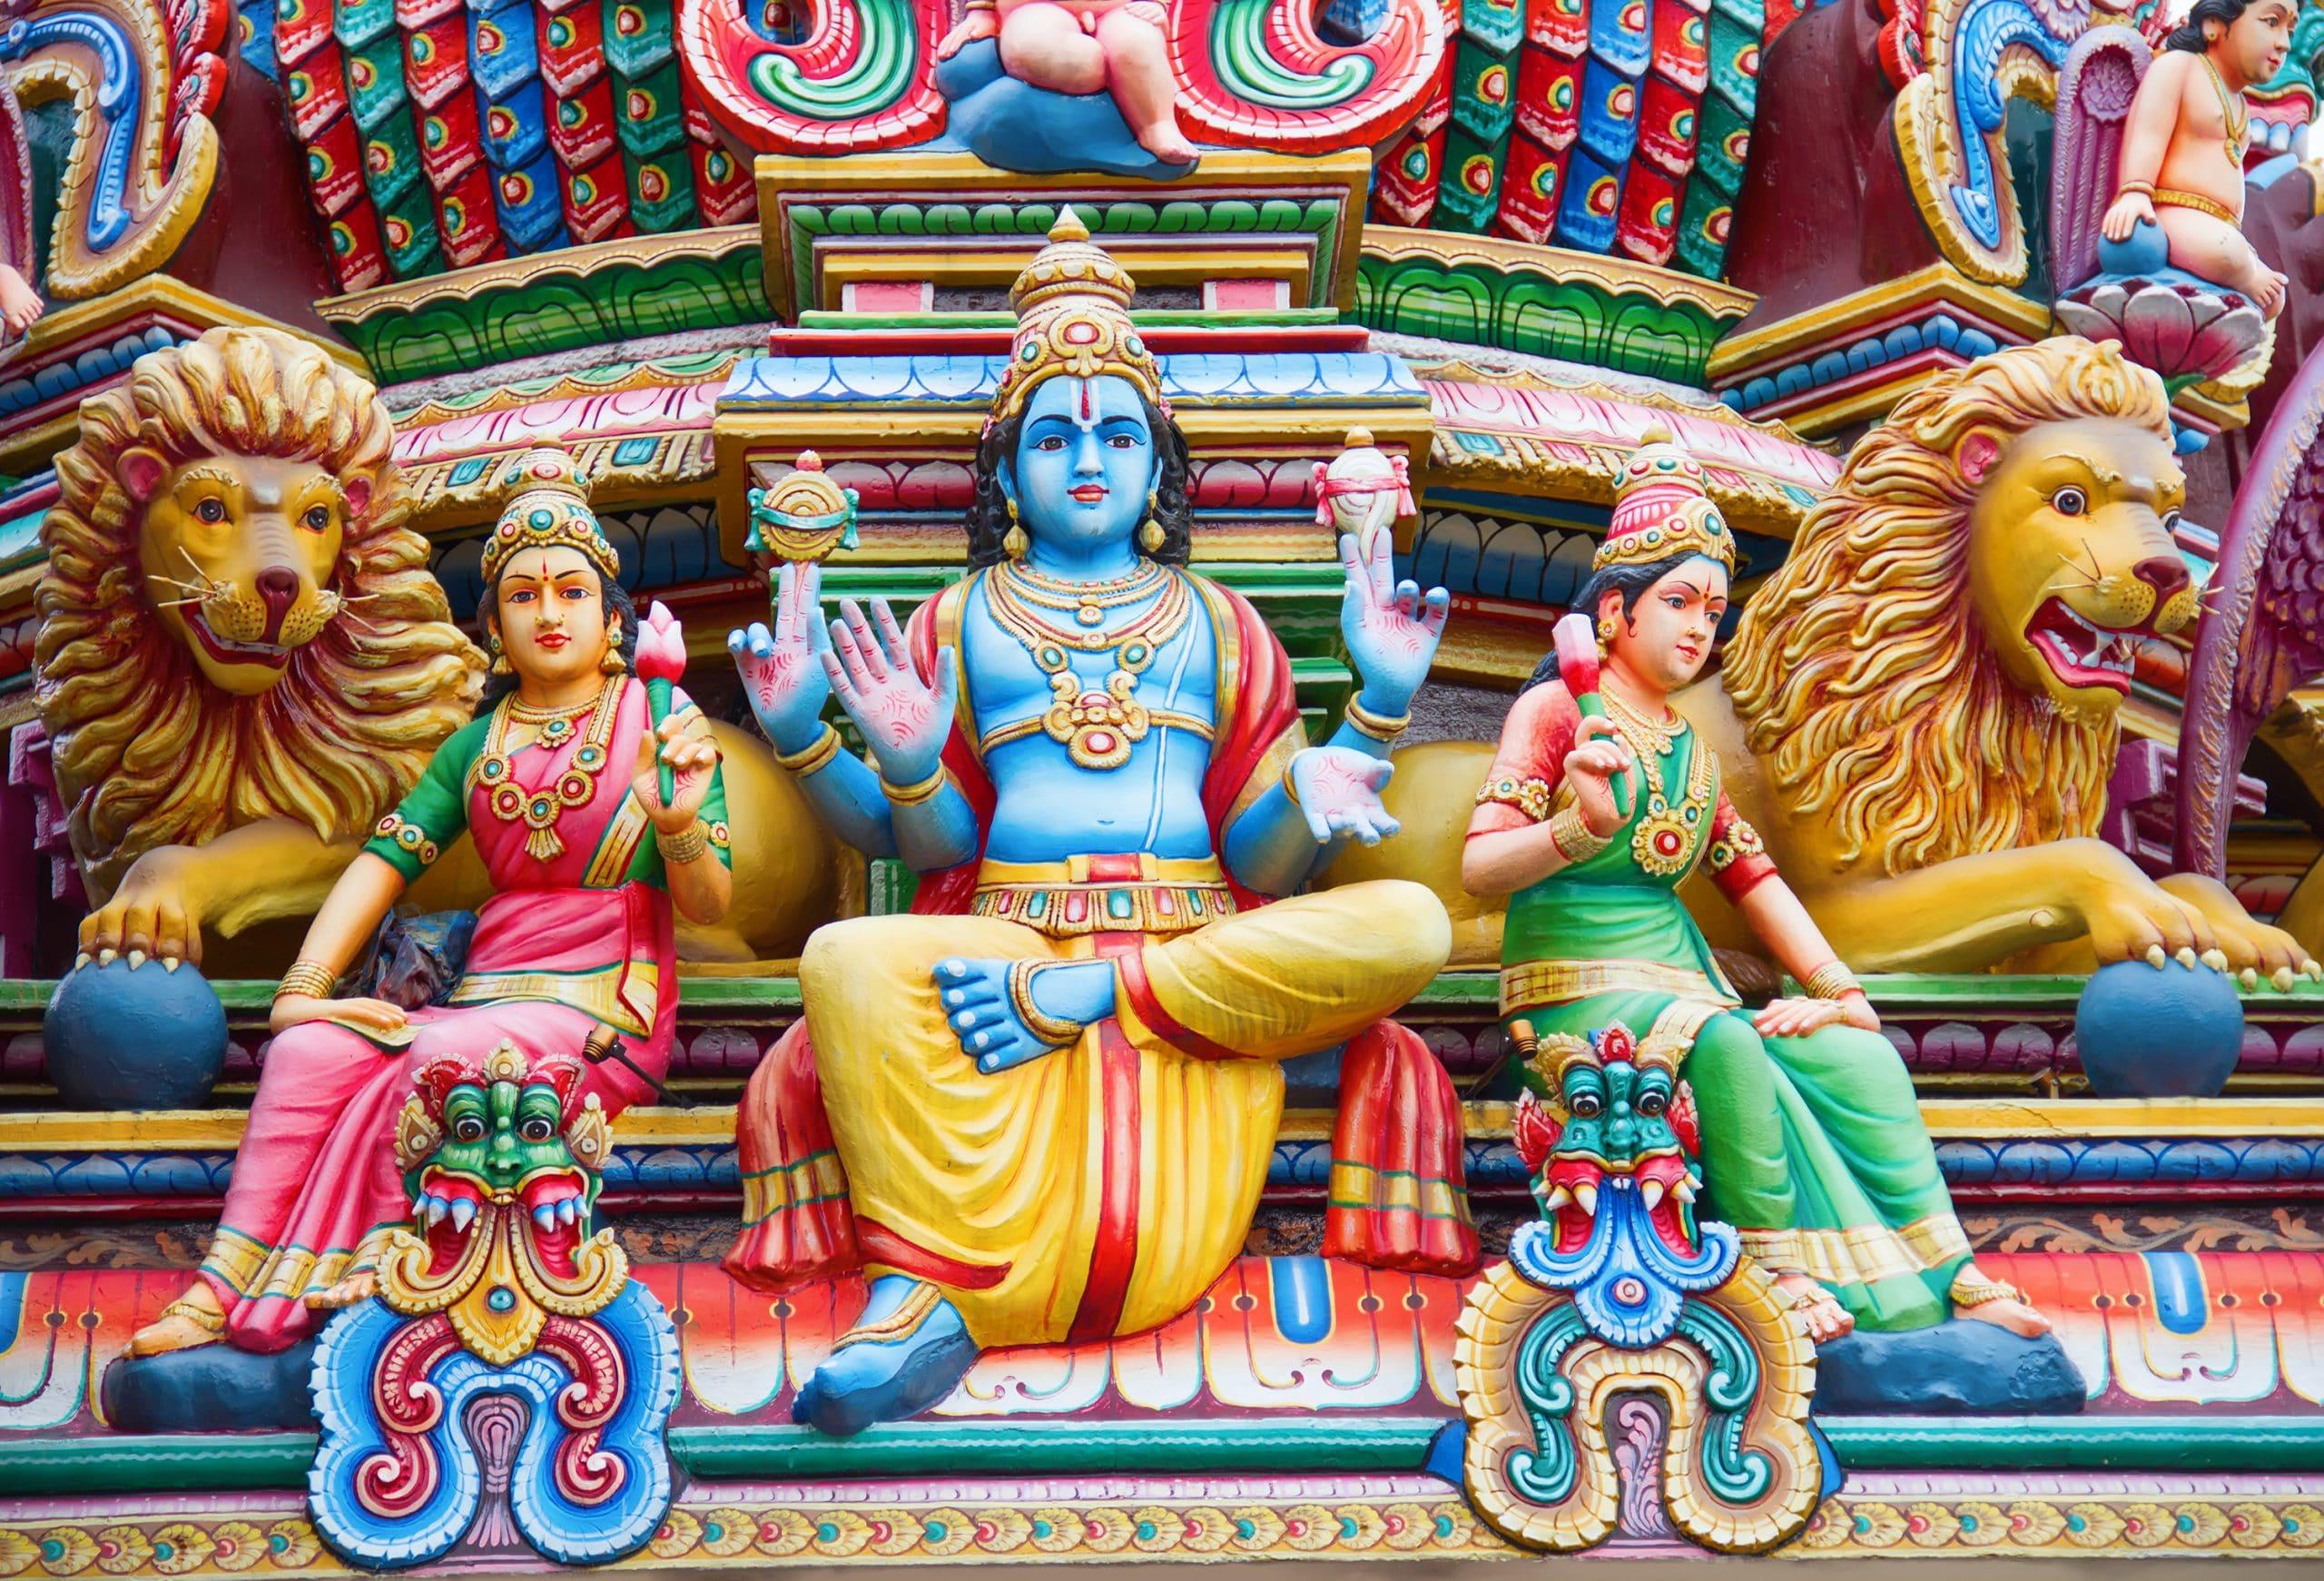 Hindu Addiction Treatment Methods And Rehab Addiction Center